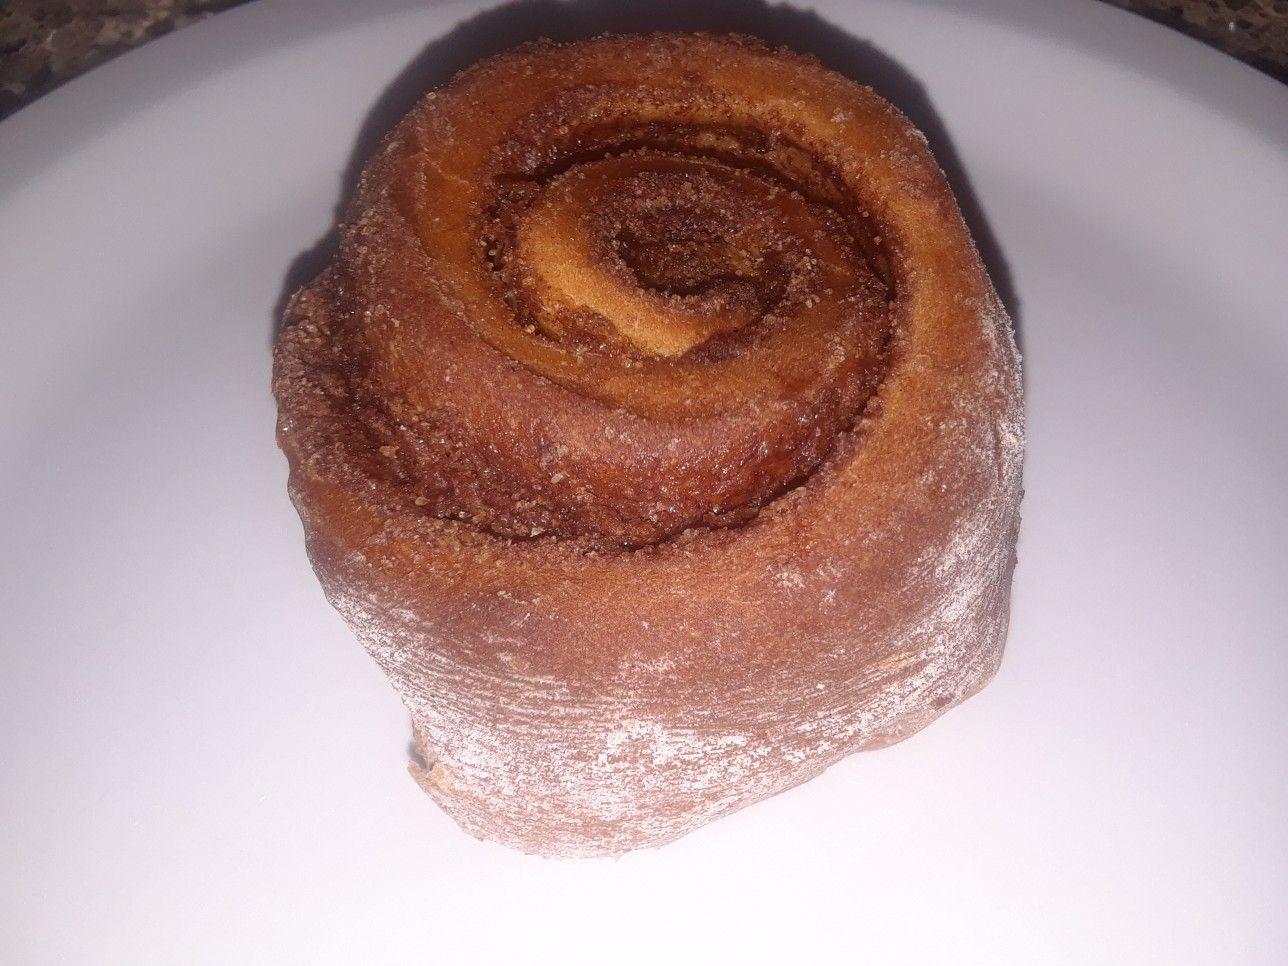 Cinnamom bakery grand blanc mi bakery cinnamon rolls